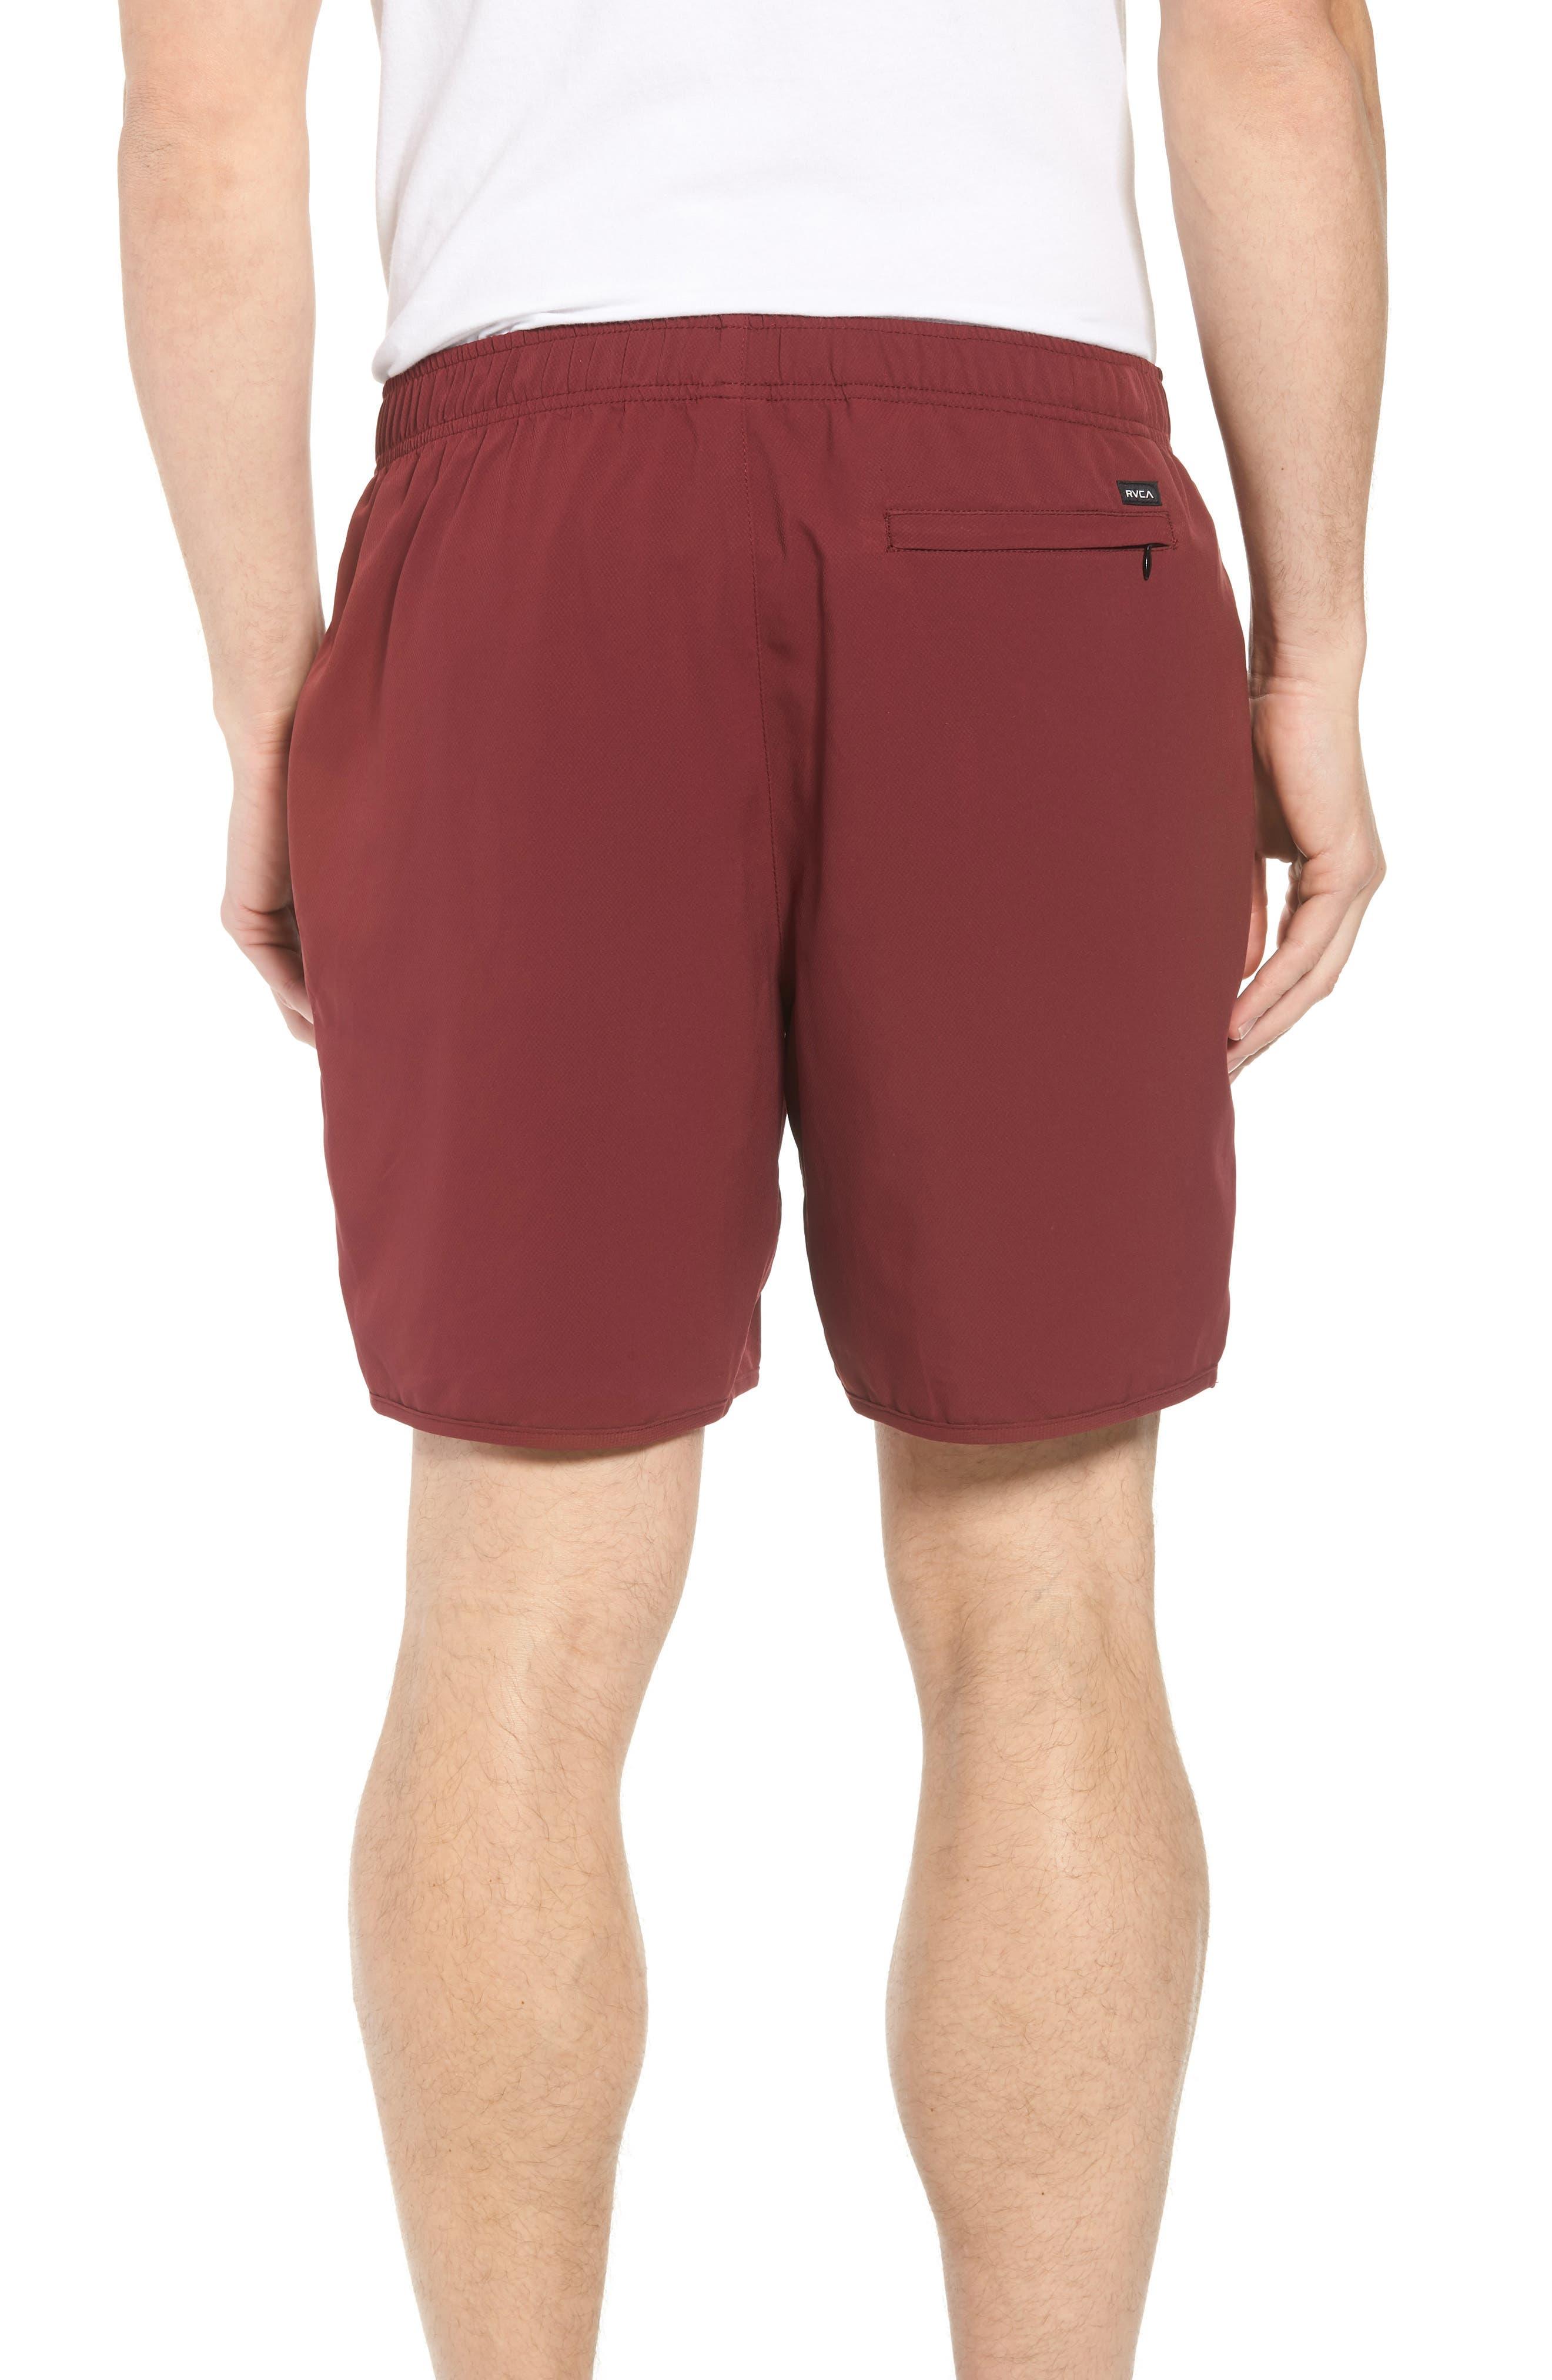 Yogger III Athletic Shorts,                             Alternate thumbnail 2, color,                             Tawny Port